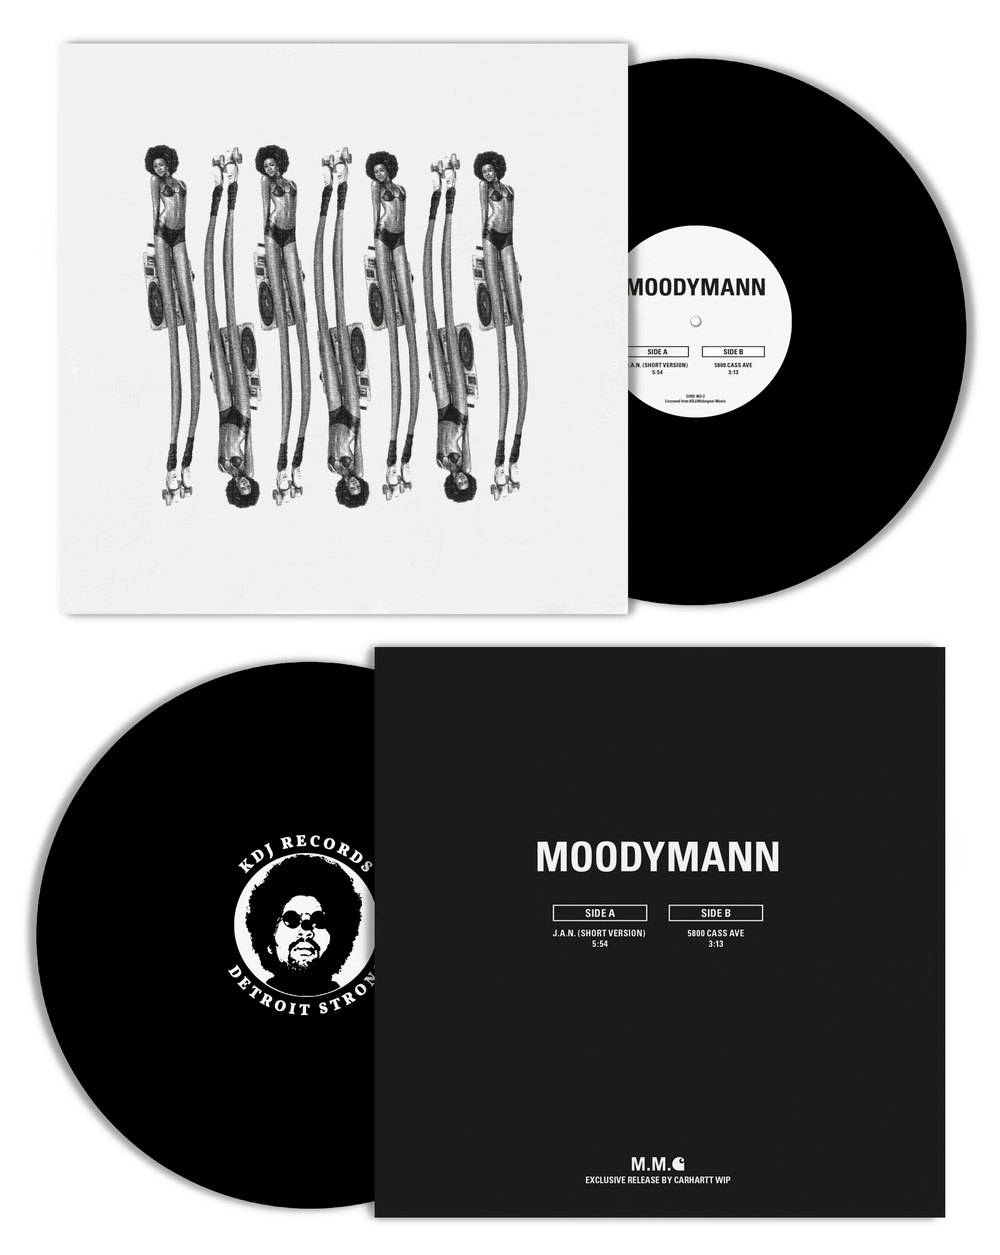 CarharttWIPxMahoganiMusic_Release_7inch_Vinyl_1.jpg